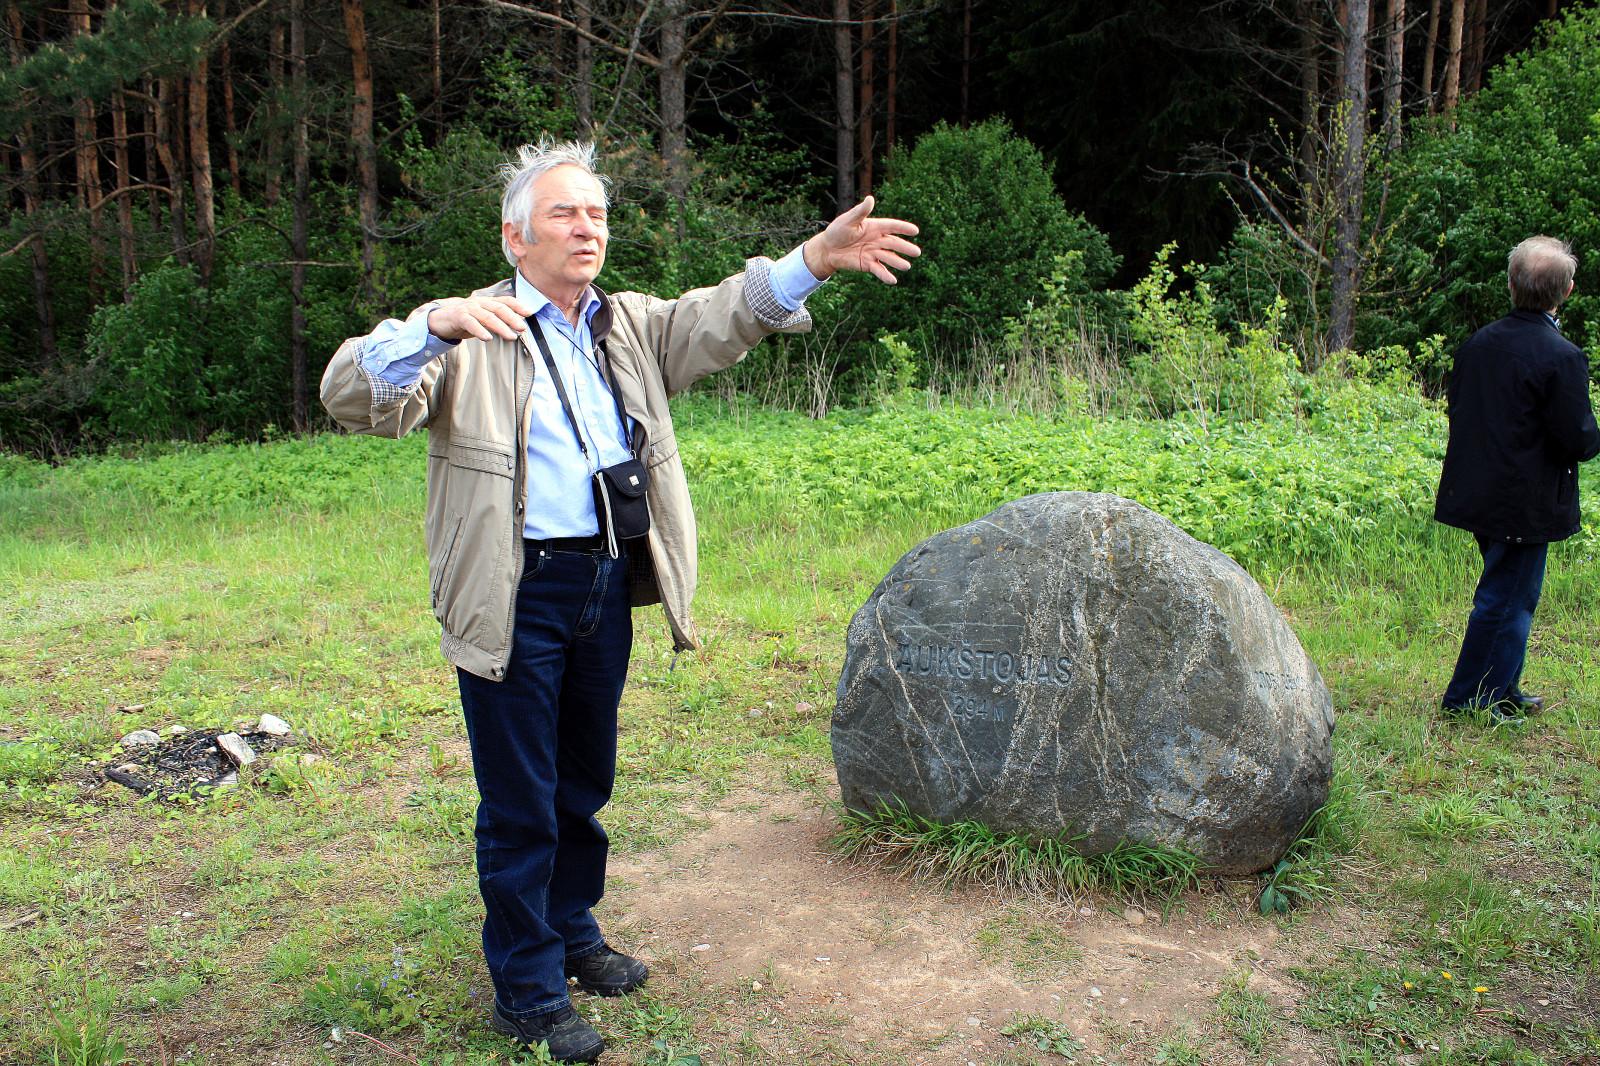 1 pav. Geografas dr. Rimantas Krupickas / Fig. 1. Geographer dr. Rimantas Krupickas